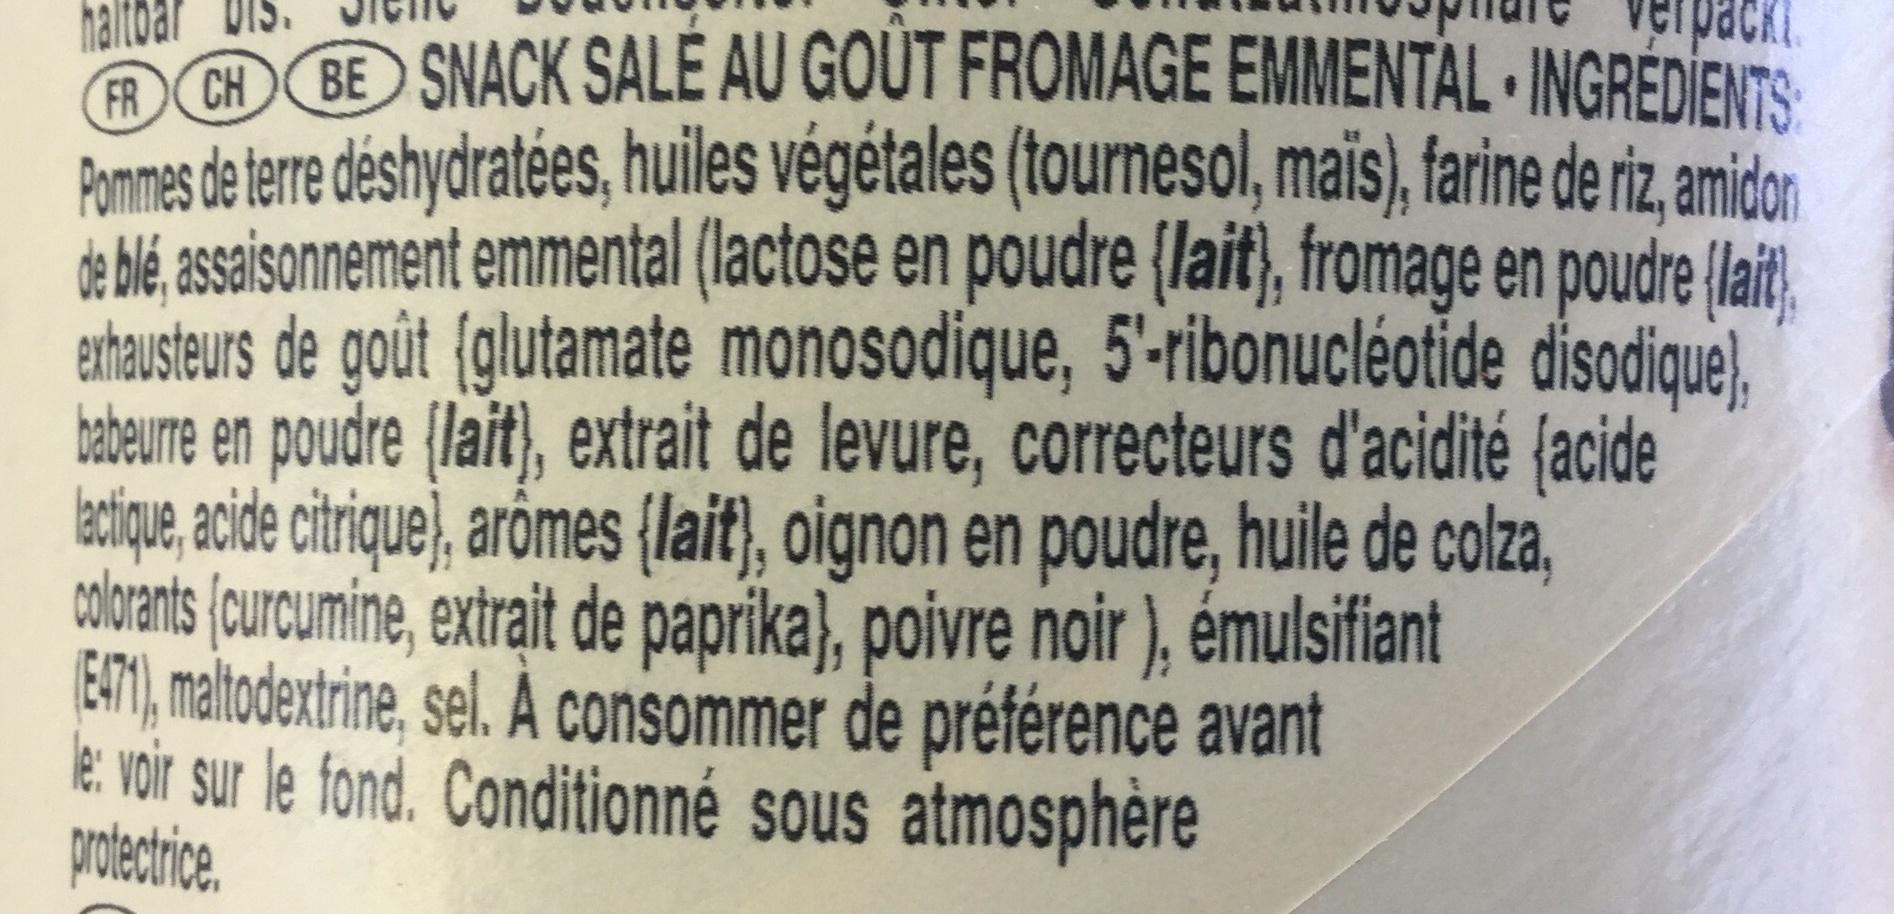 Snack salé au goût emmental - Ingredienti - fr